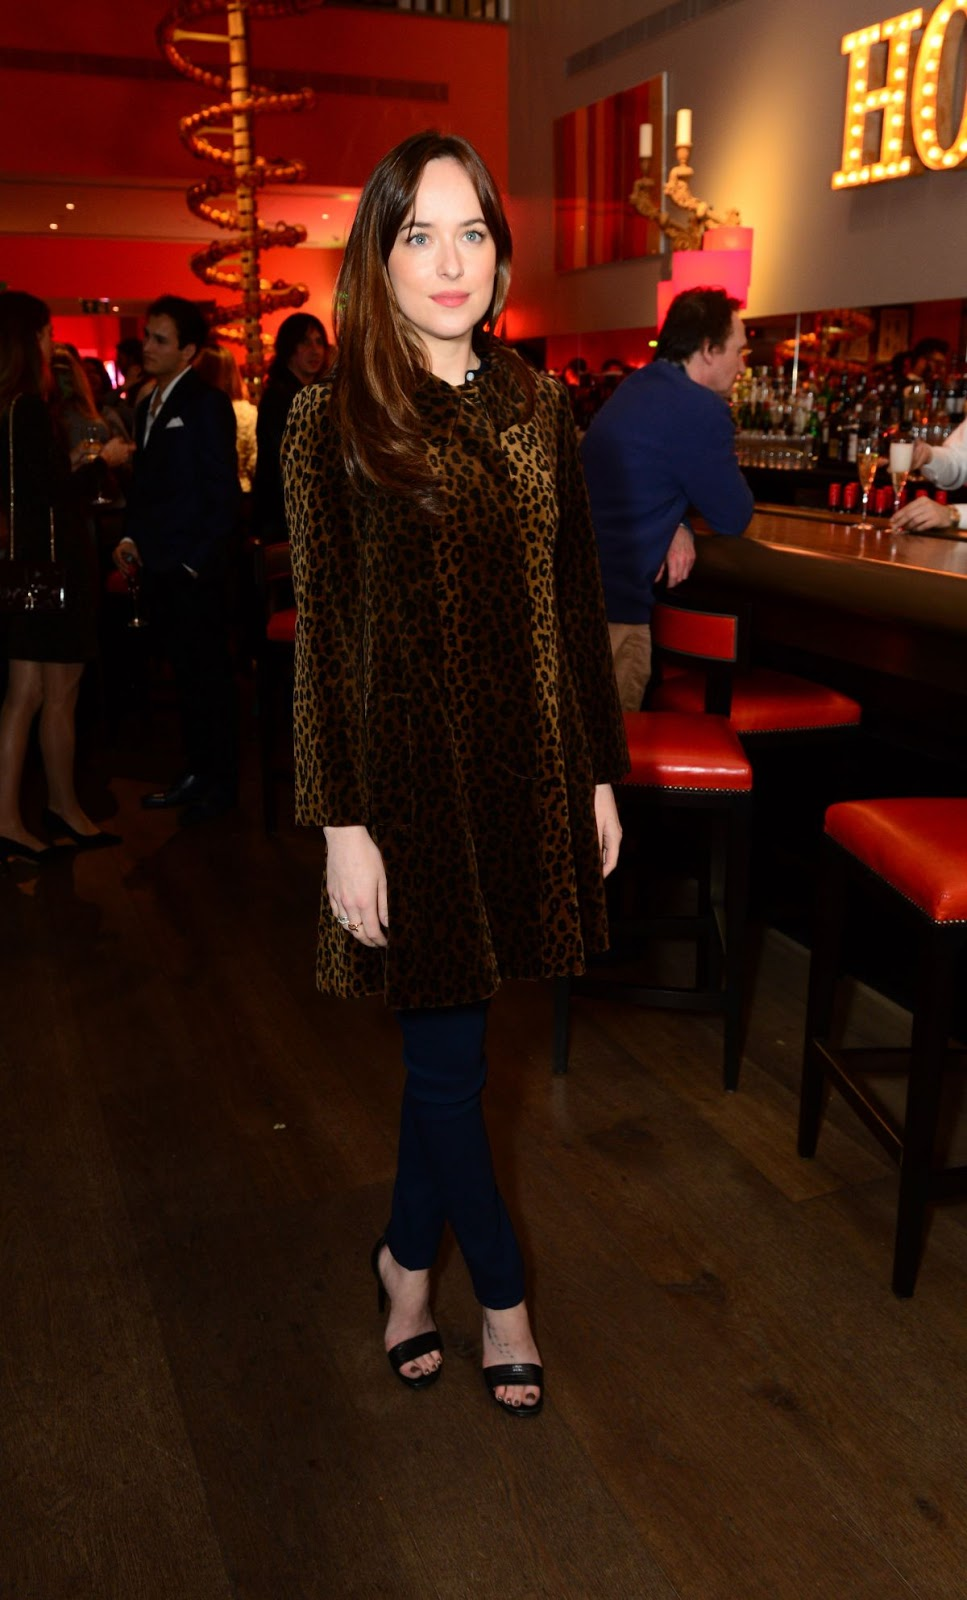 Dakota Johnson at Bigger Splash Photocall in London